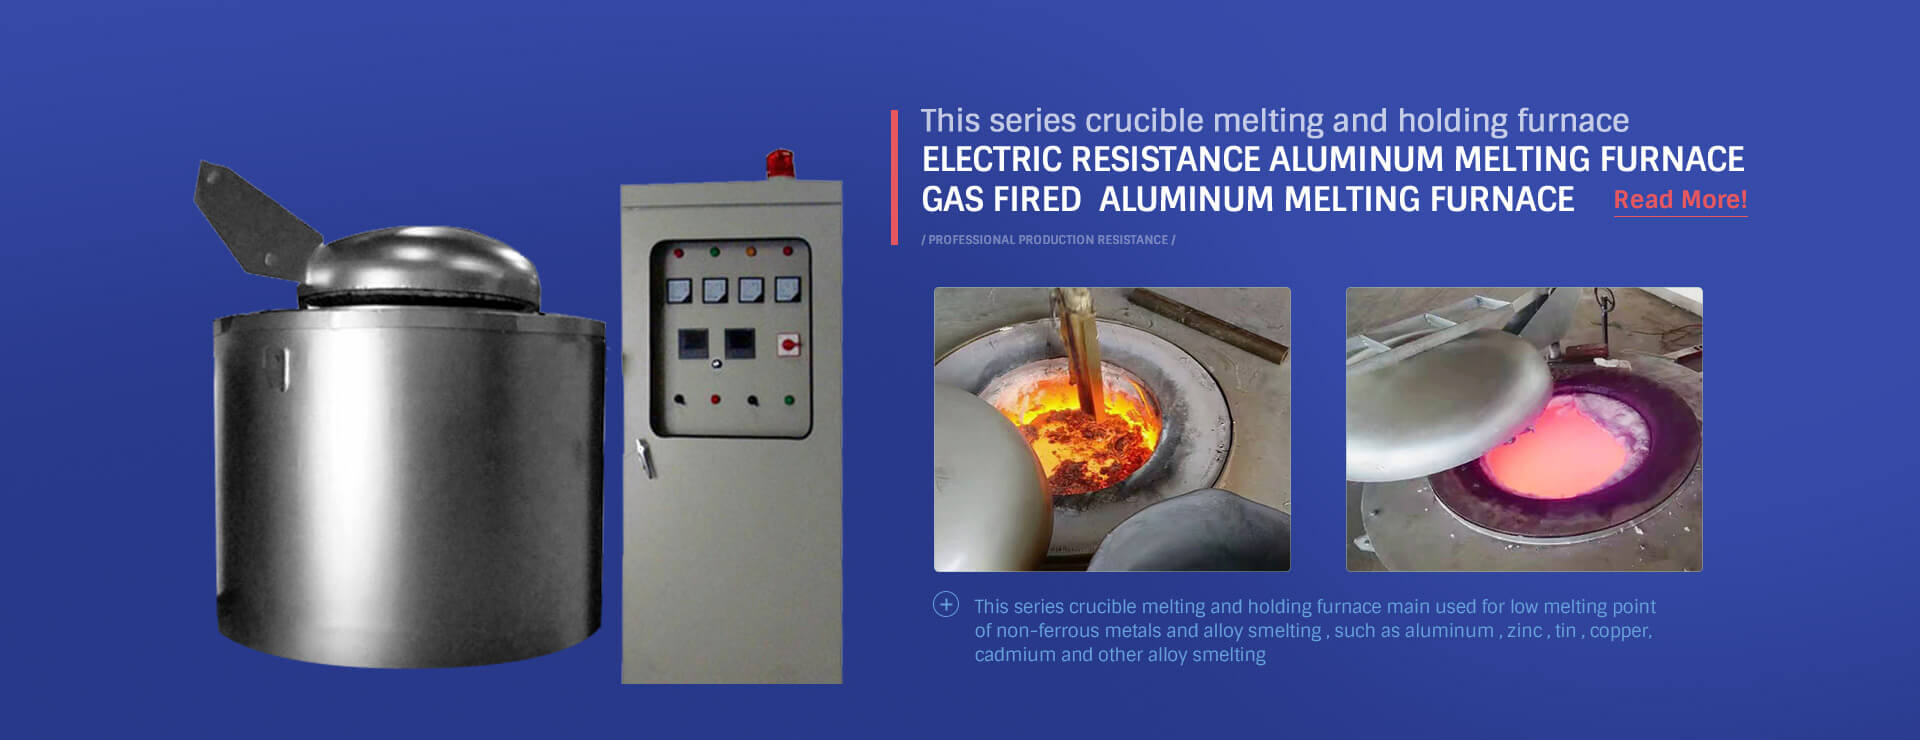 Electric Resistance Crucible Melting Furnace